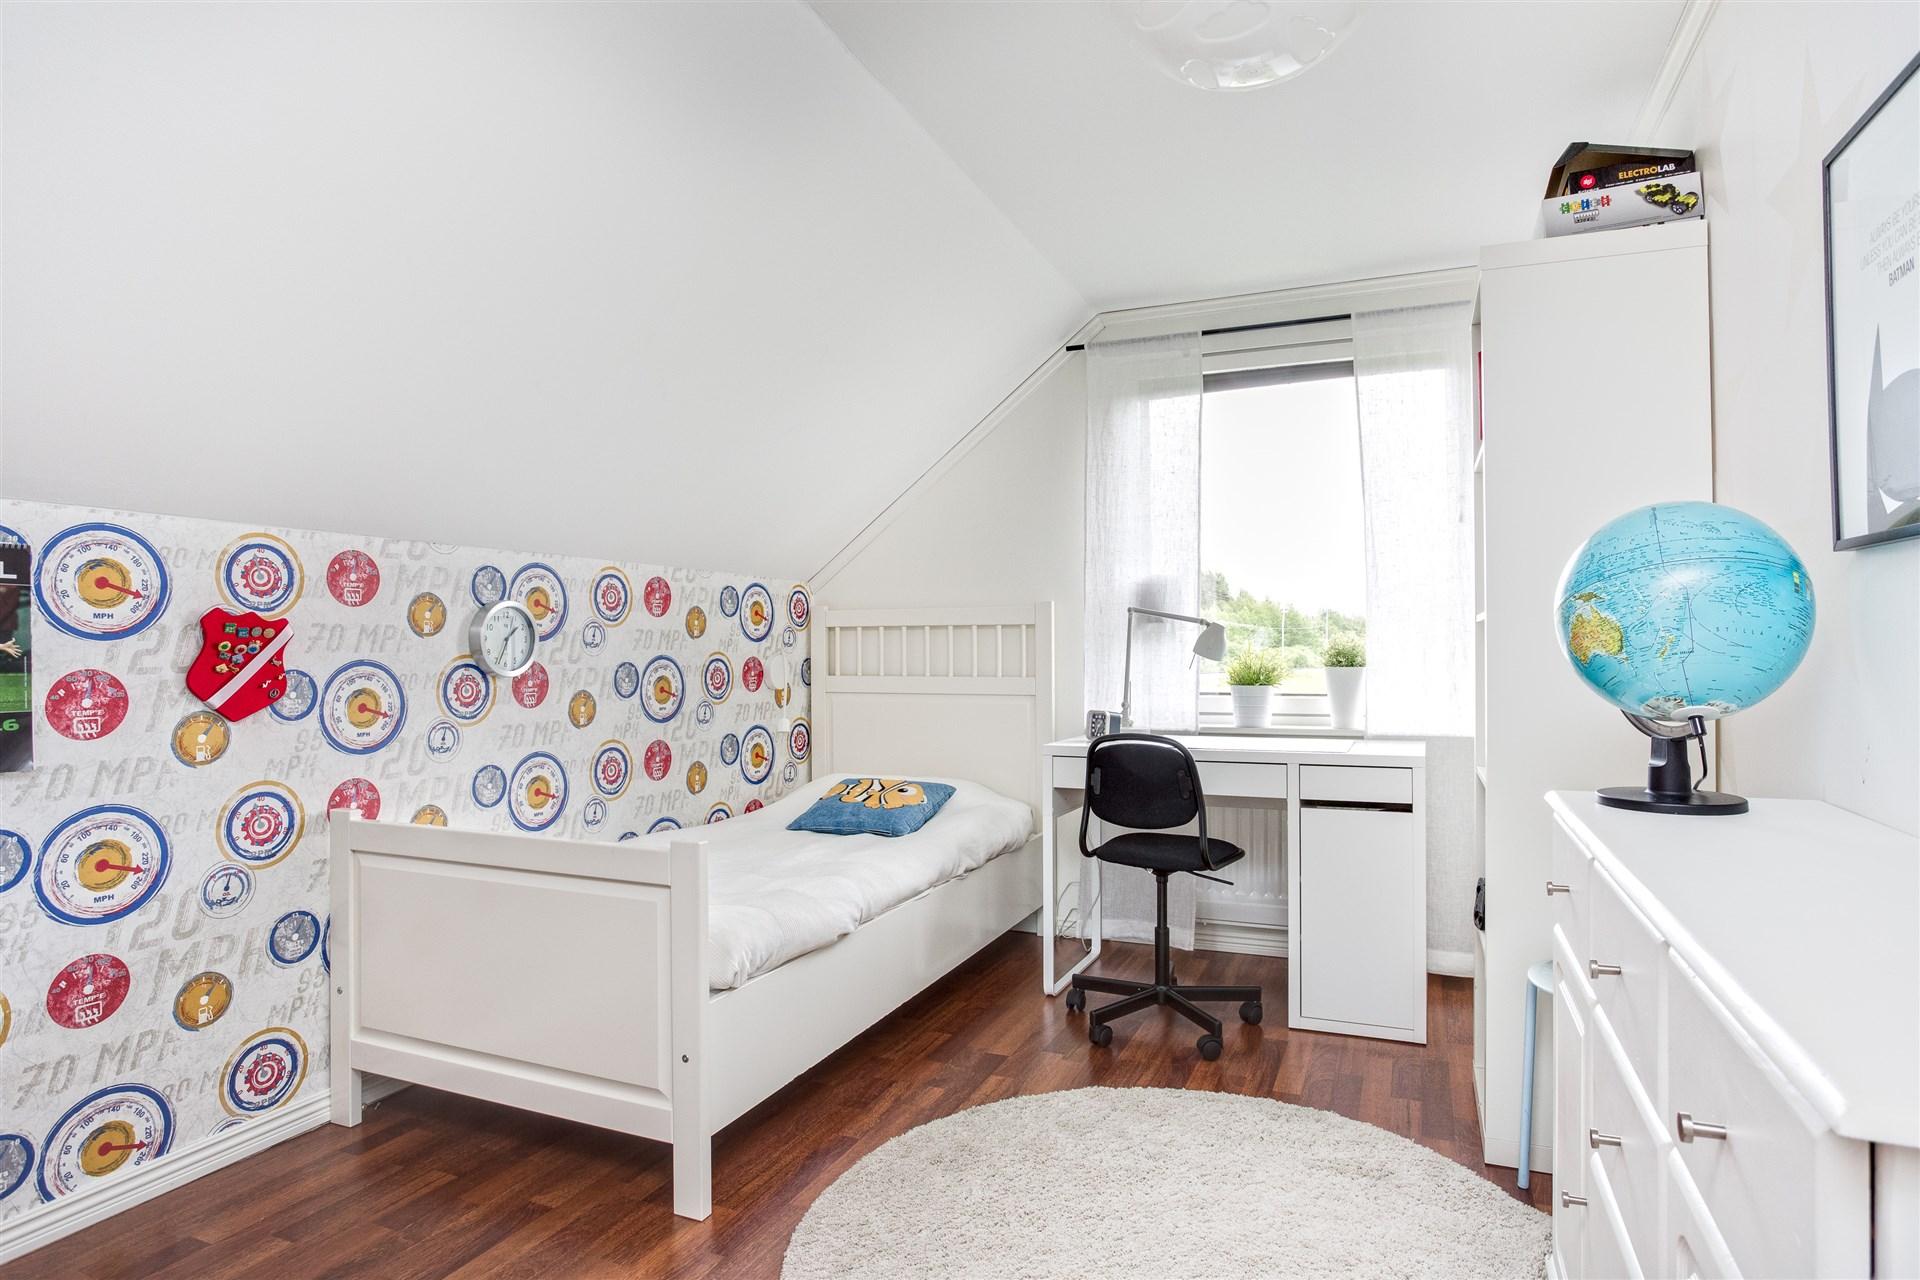 Sovrum 5 renoverat 2017 med 1 garderob.